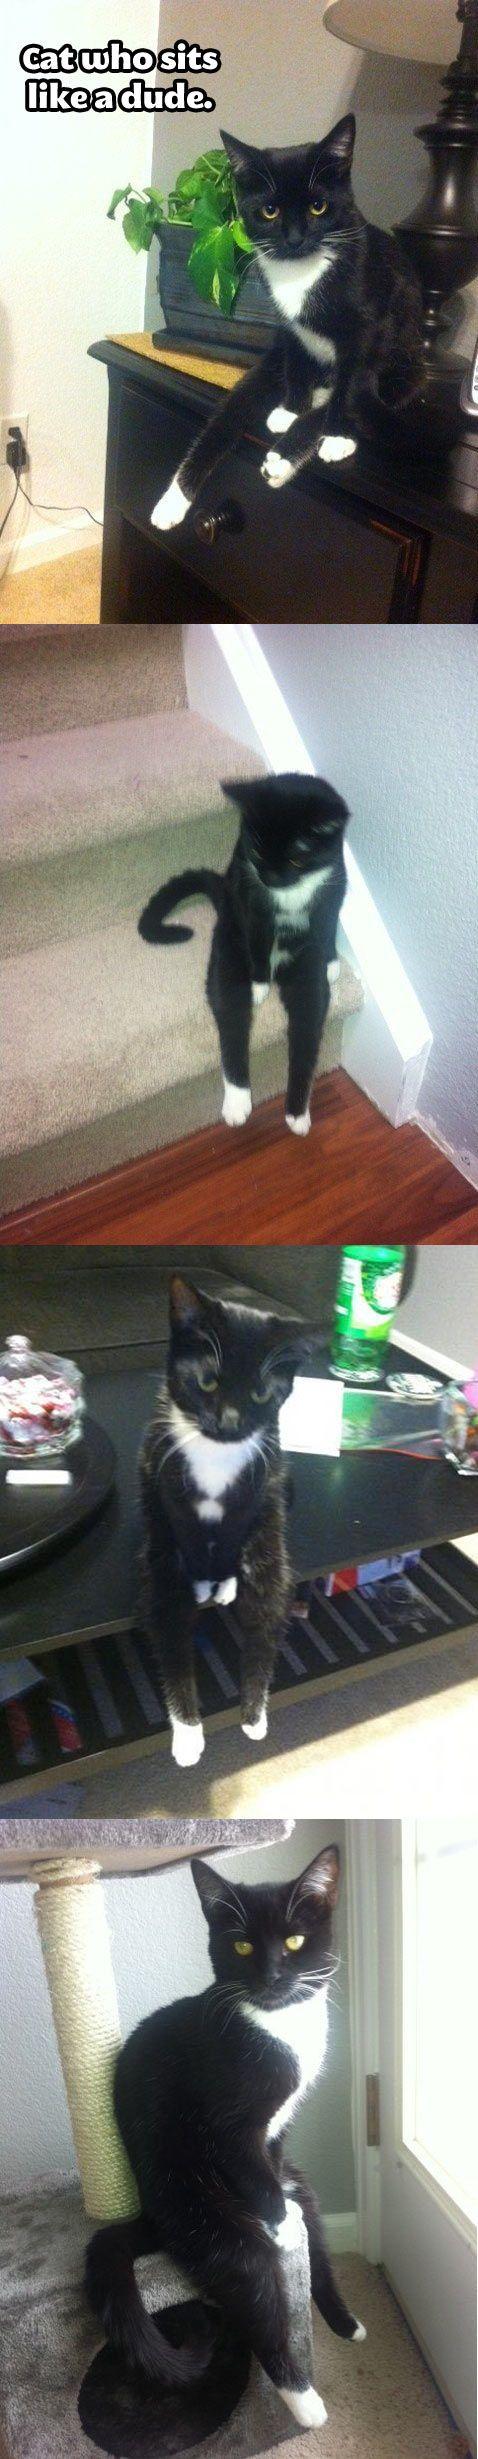 The cat who sits like a dude… WTF